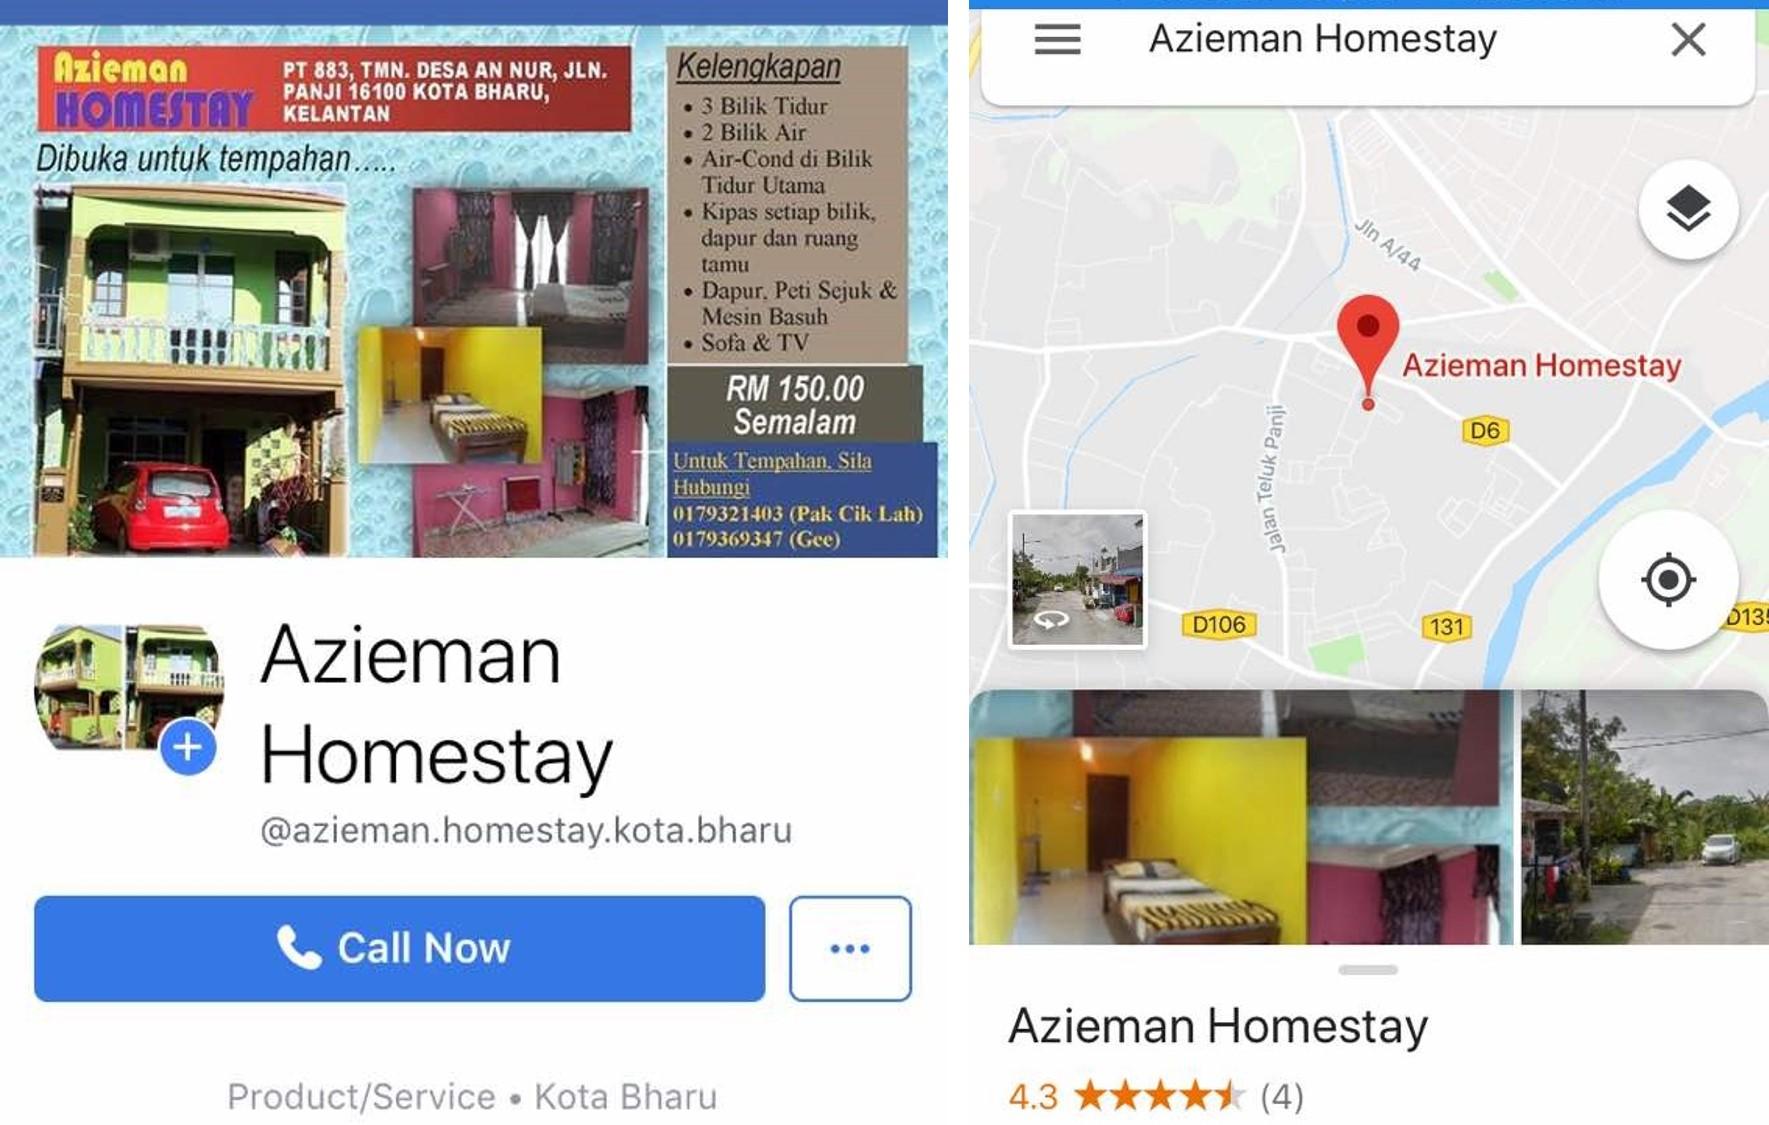 Azieman Homestay